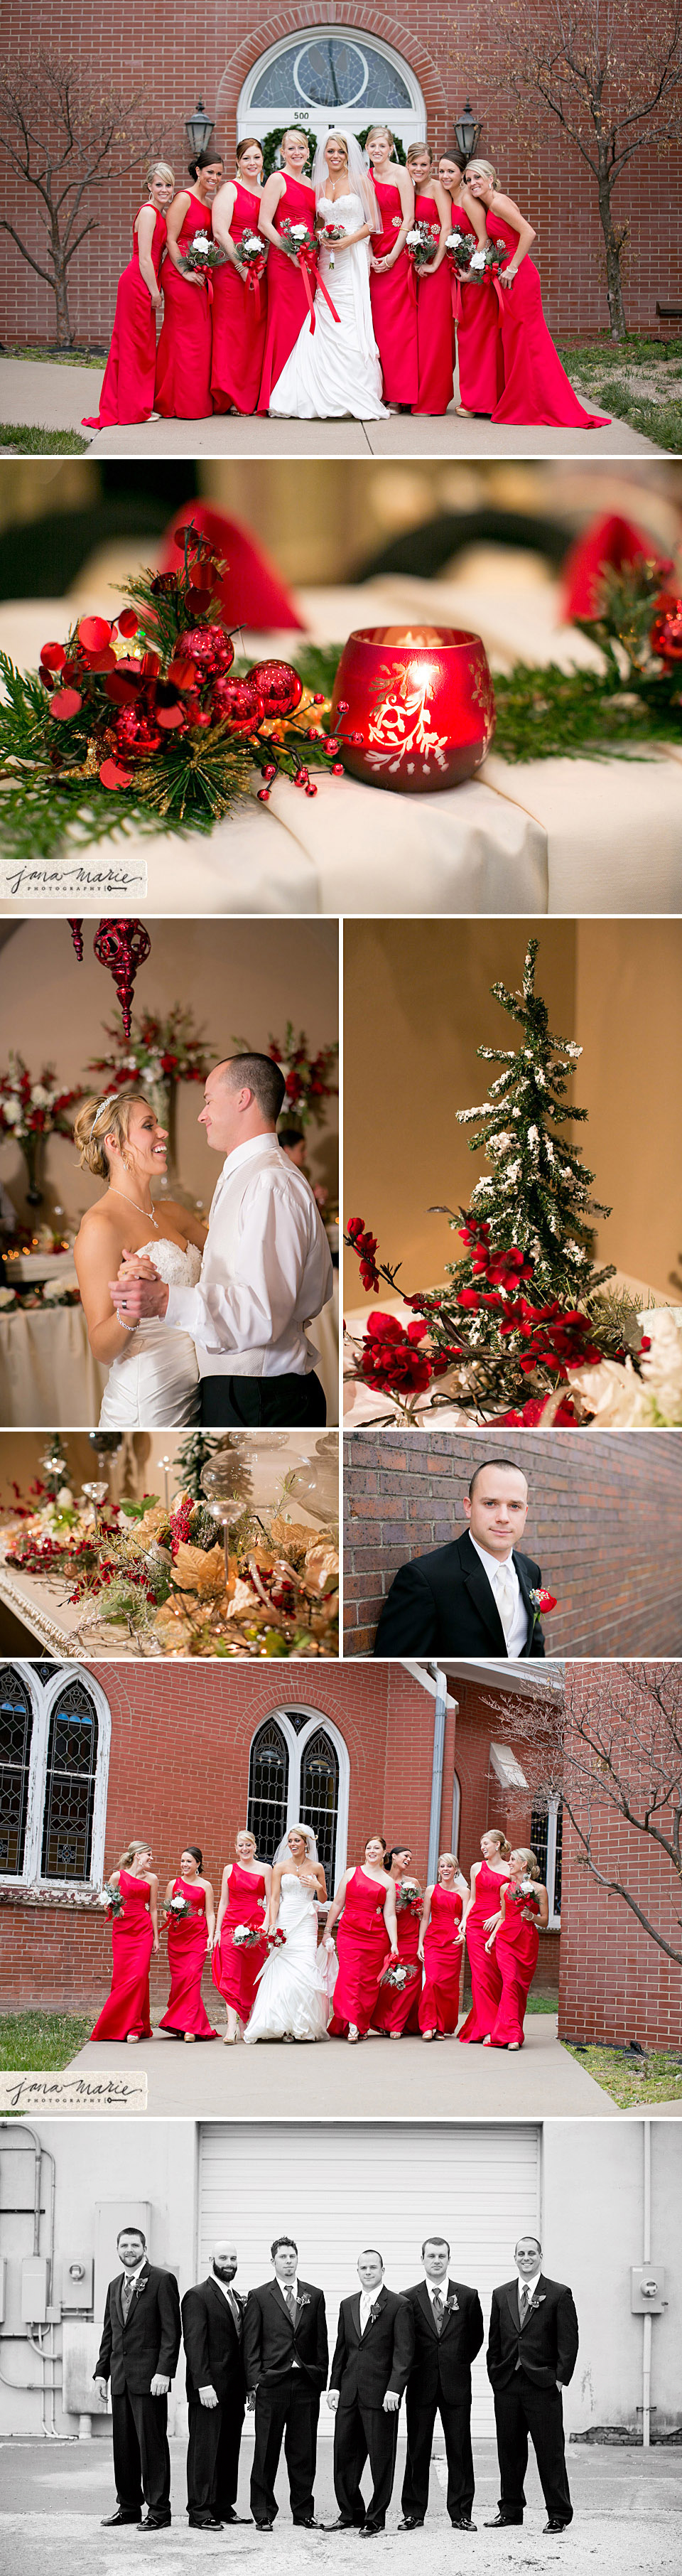 First dance, couples, groom, Winter wedding ideas, KC venues, Jana Marie Photography